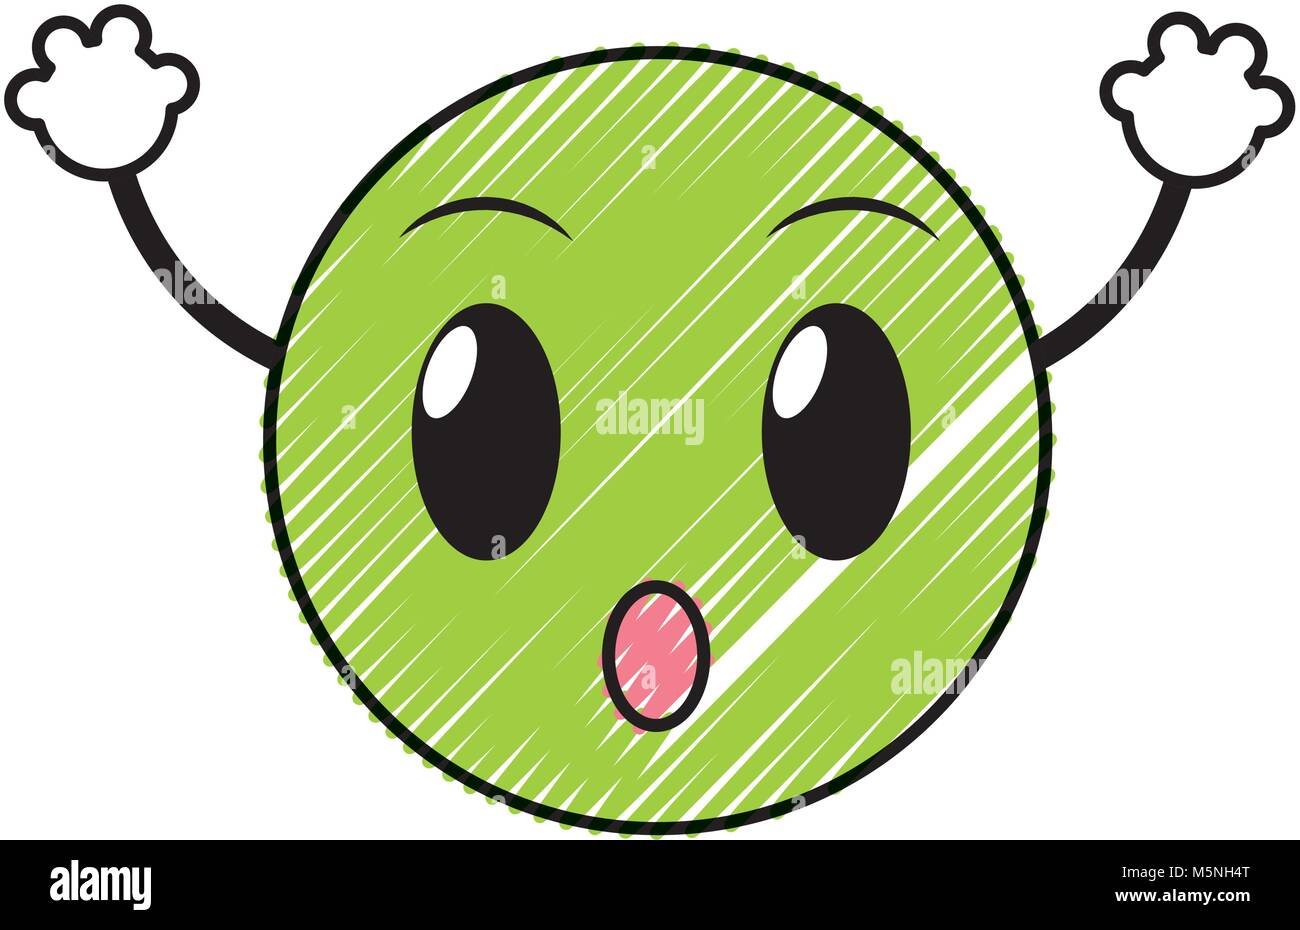 shocked face cartoon stock  shocked face cartoon 1300 x 930 · jpeg